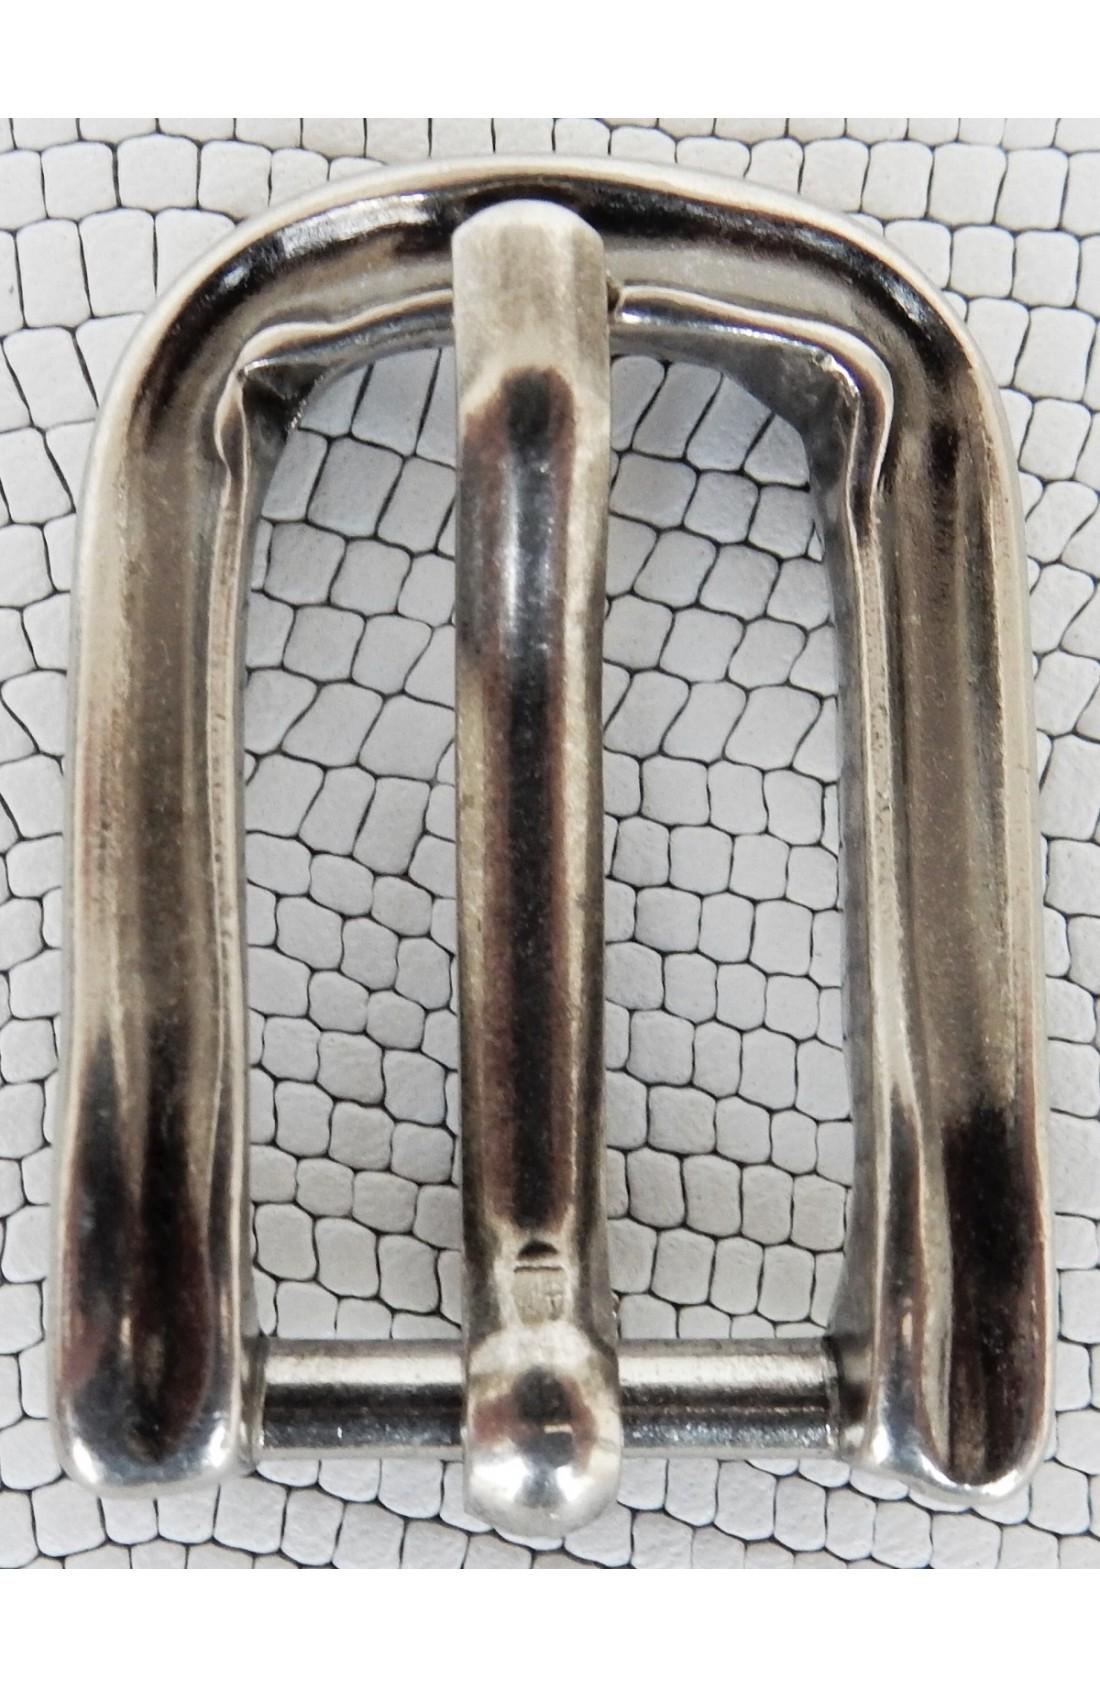 Fibbia Standard L 148 mm.15 nikel vecchio (1)